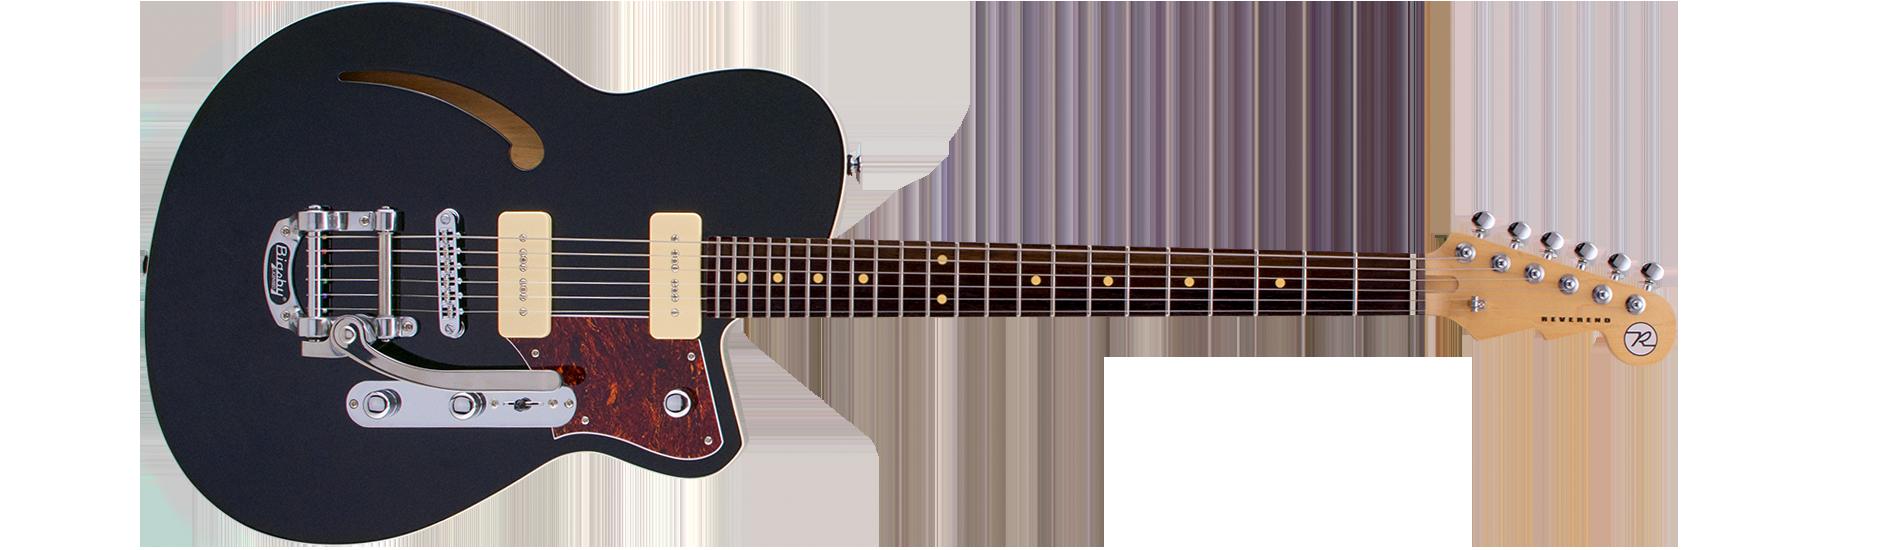 guitars club king 290